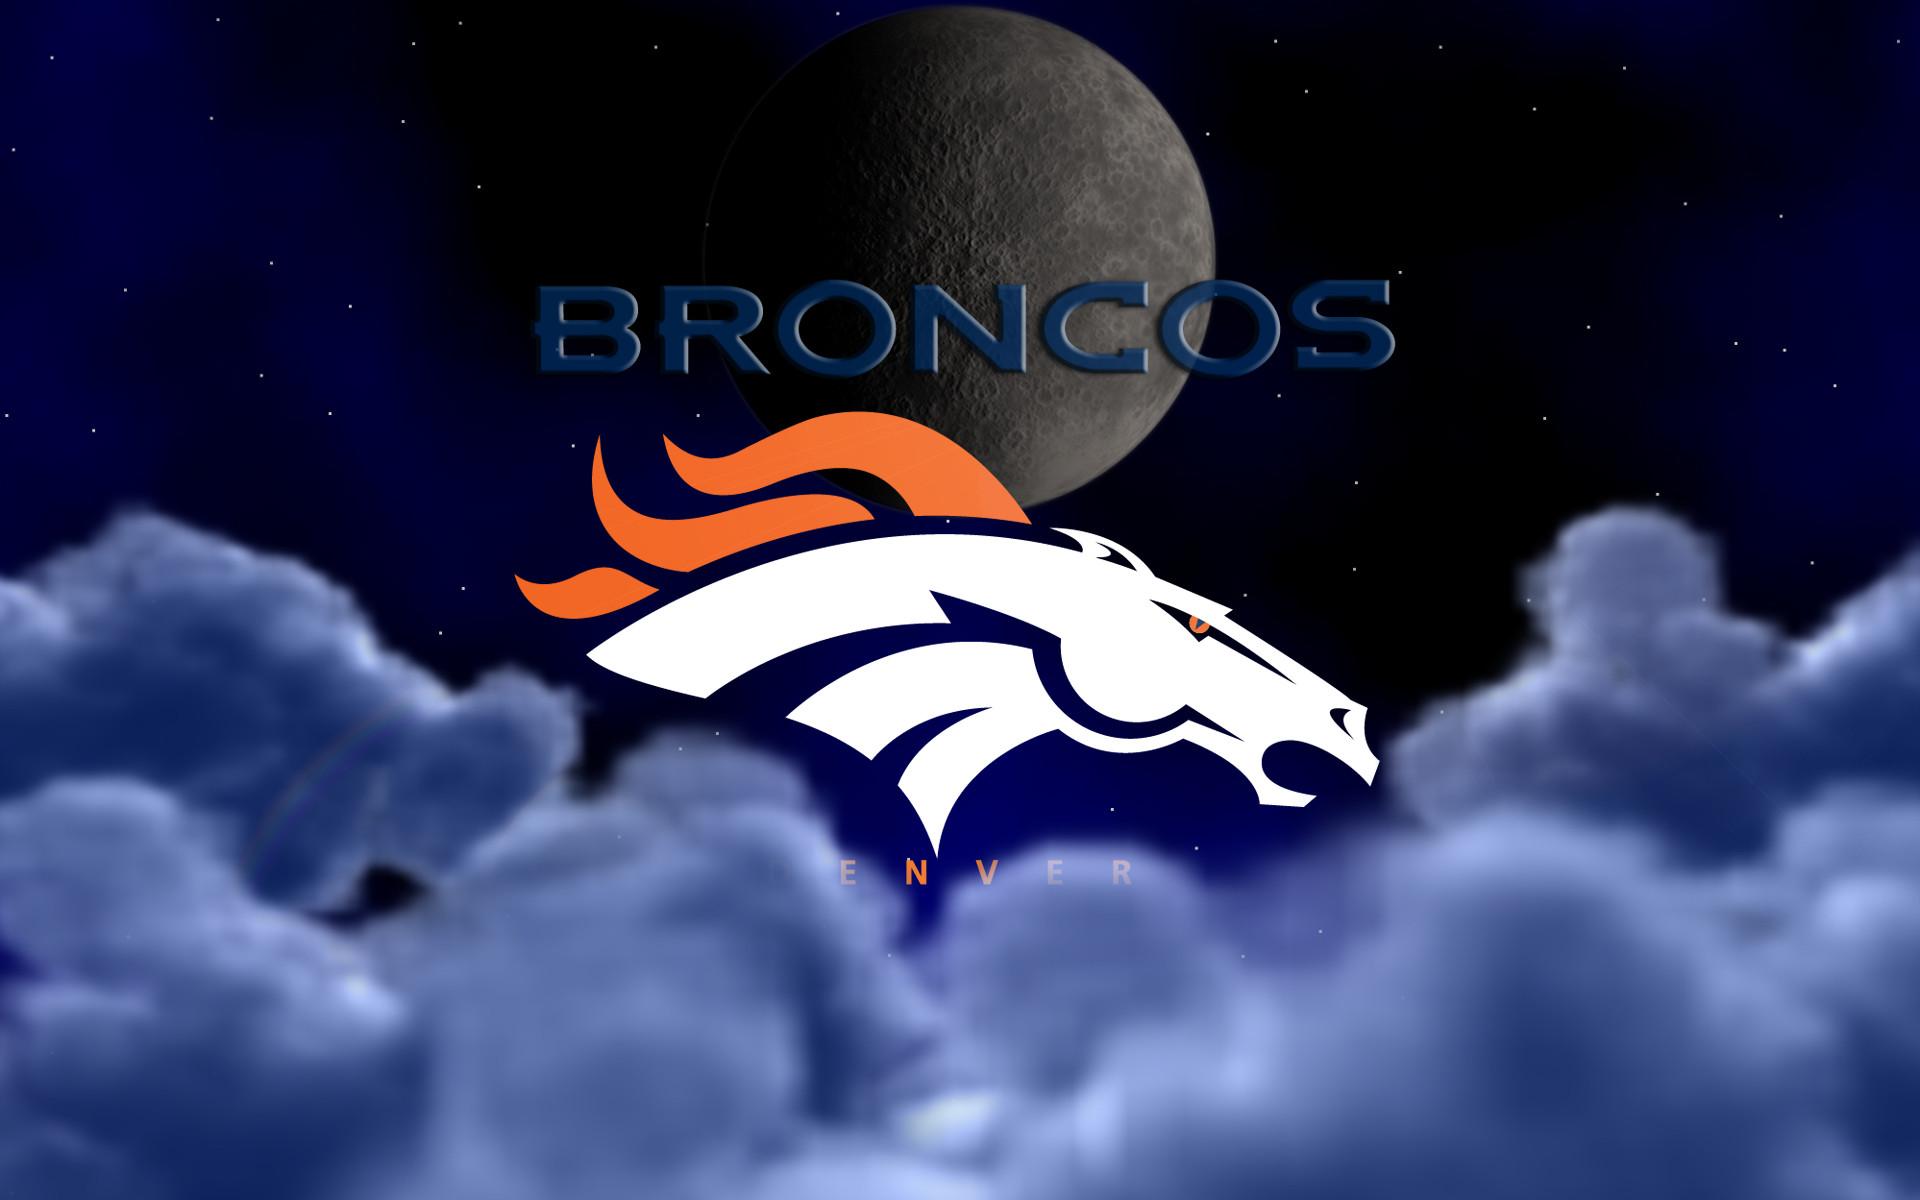 Denver Broncos Wallpaper HD Download Free   PixelsTalk Net